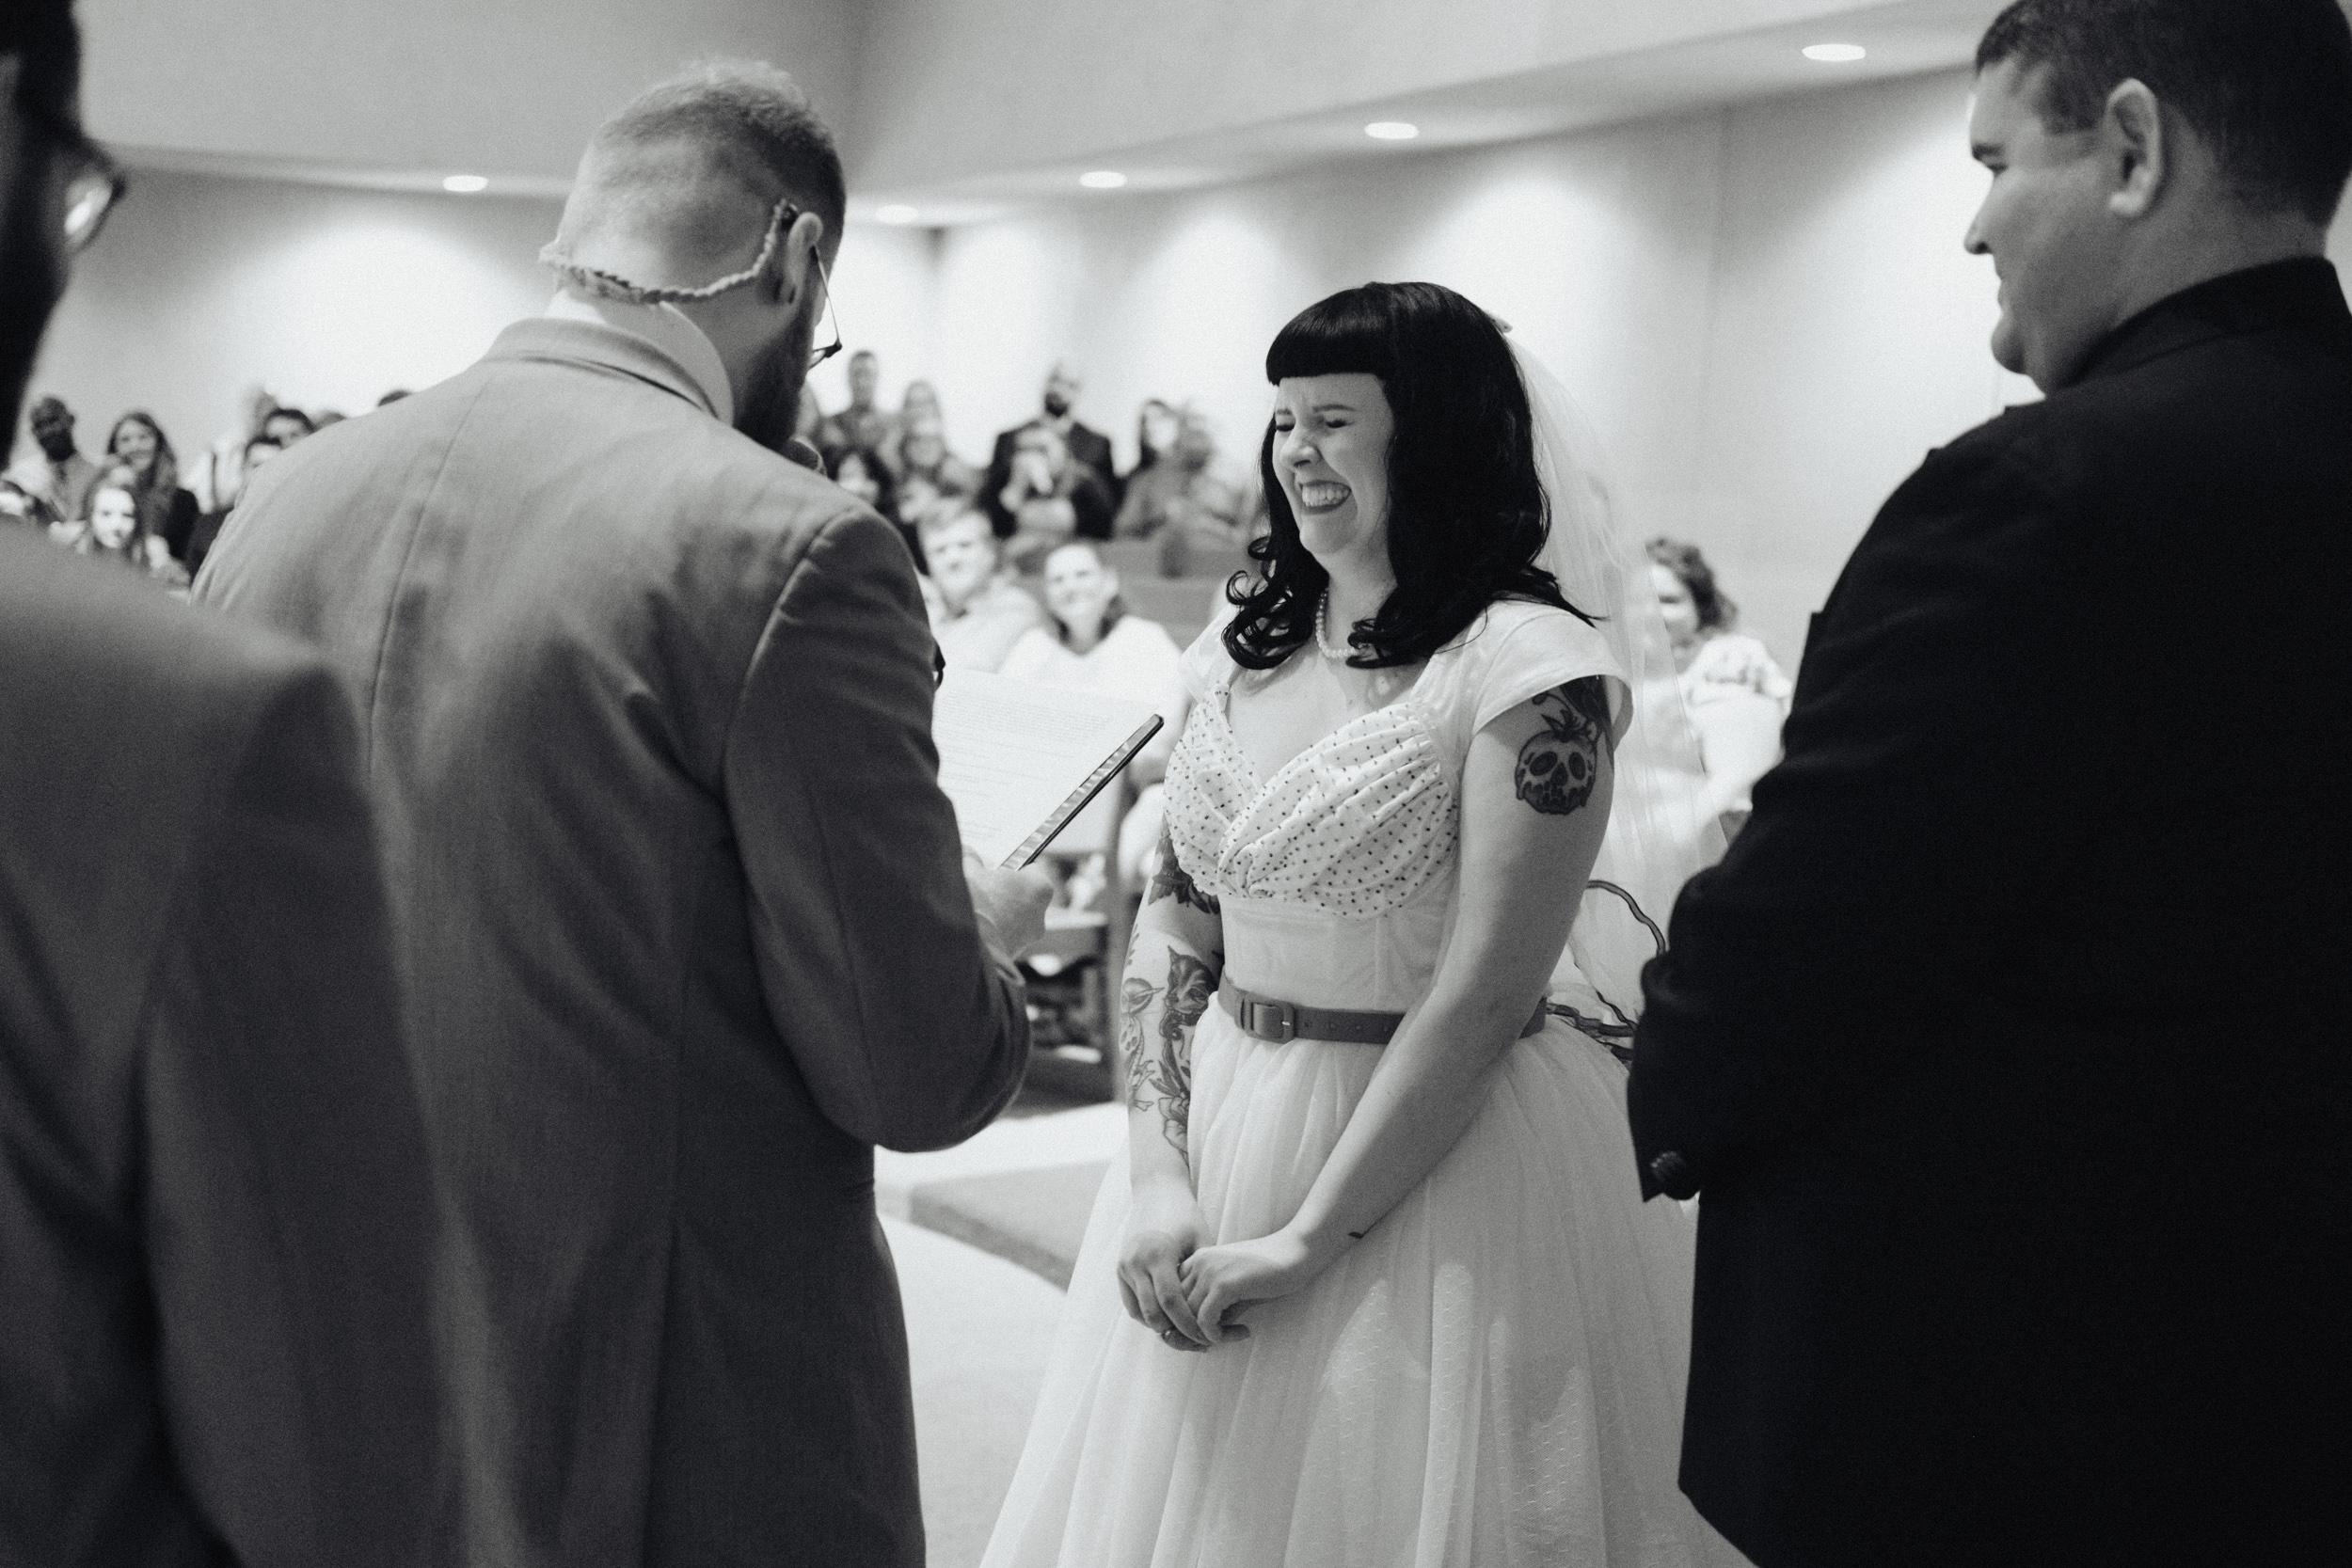 Christian & Sarah wedding photography by Brian milo-166.jpg